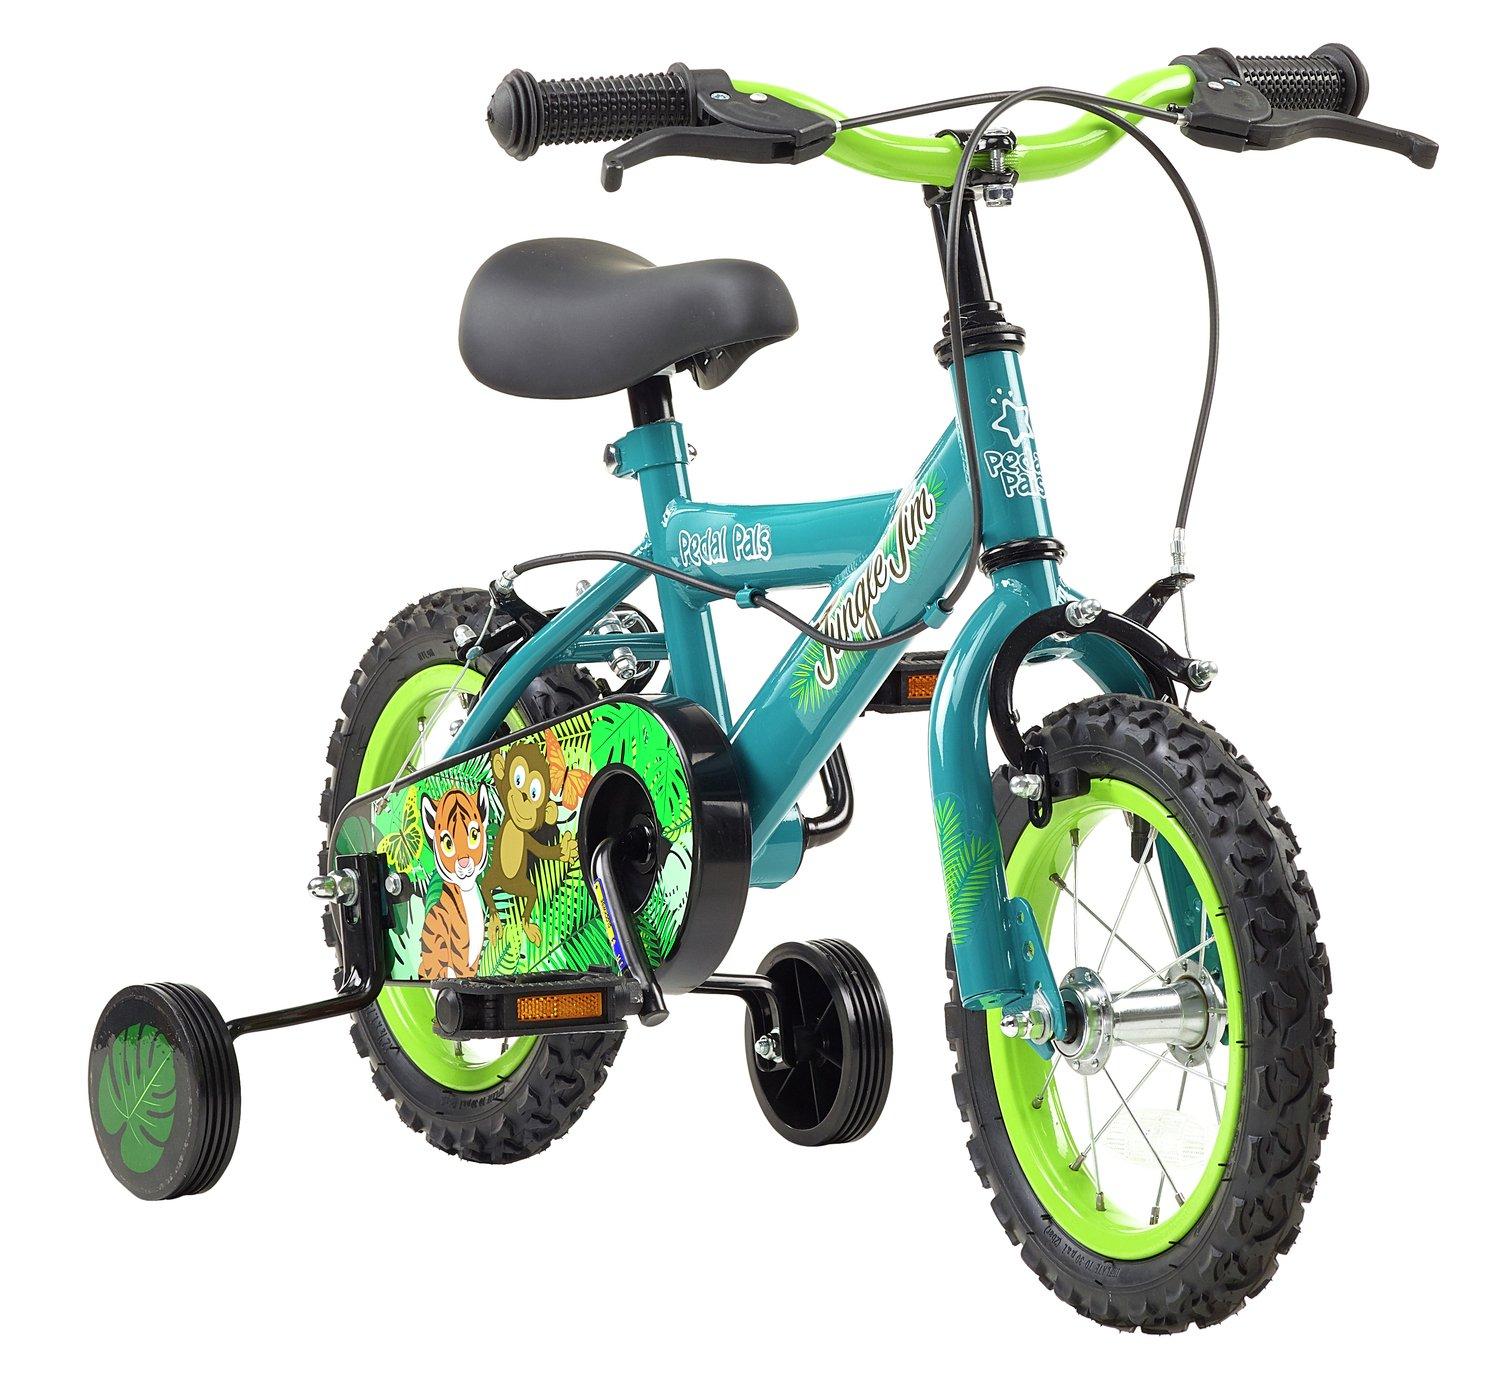 Pedal Pals 12 Inch Jungle Jim Kids Bike